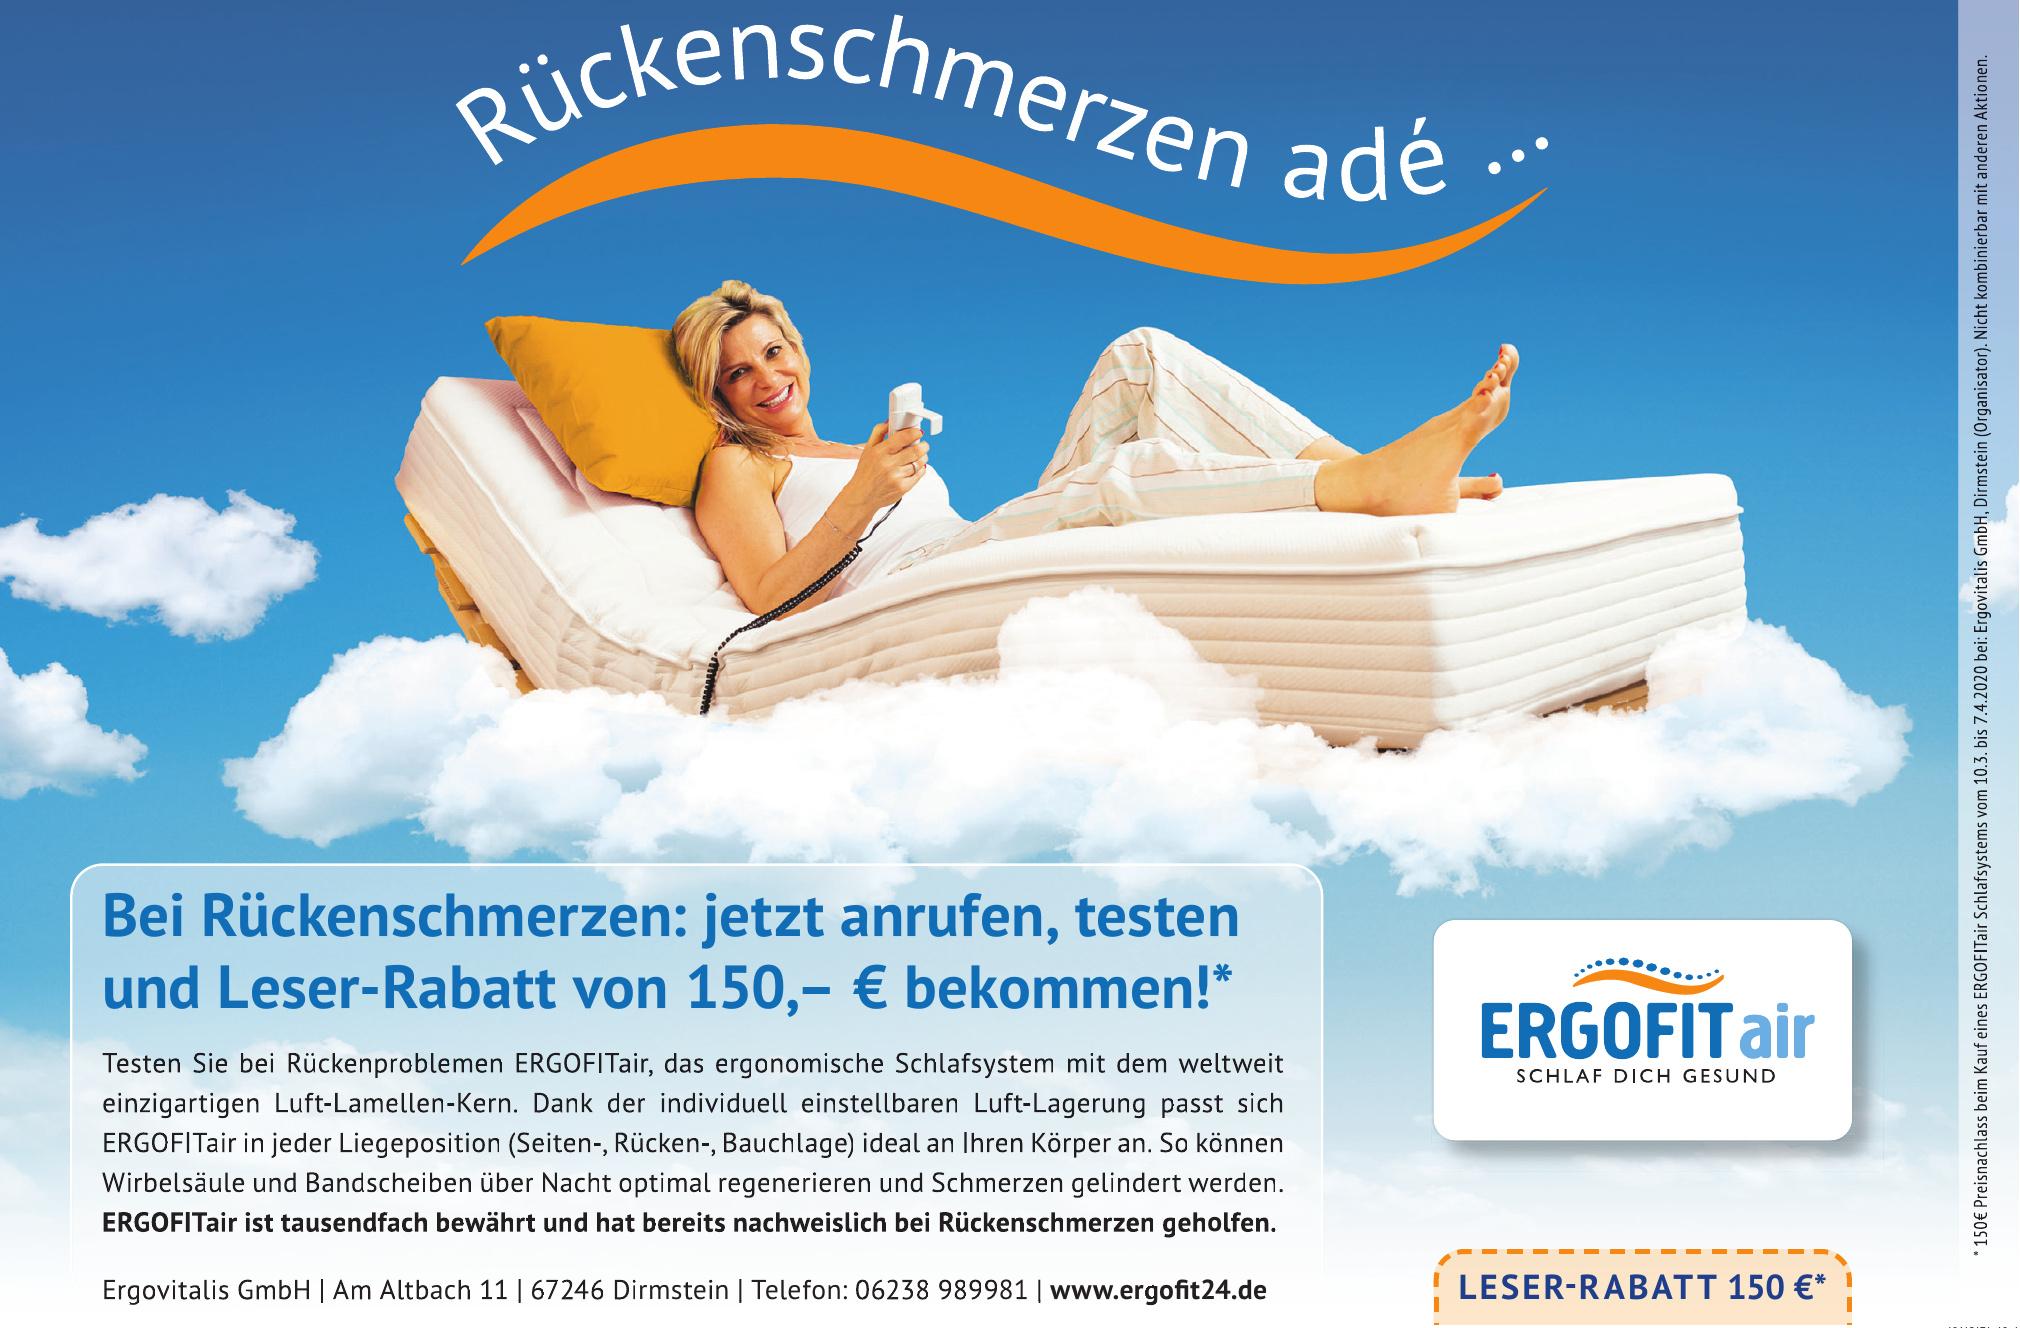 ERGO VITALIS GmbH